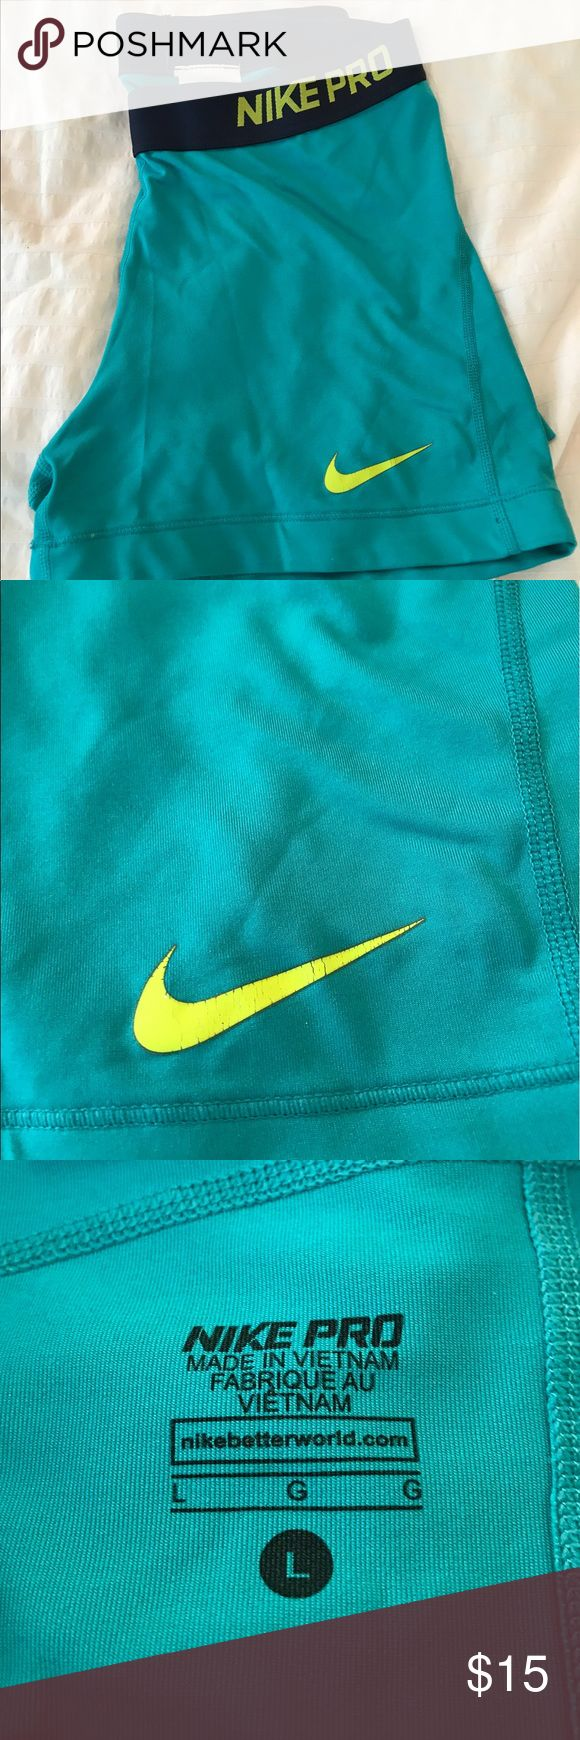 nike pro spandex blue and green Nike Shorts